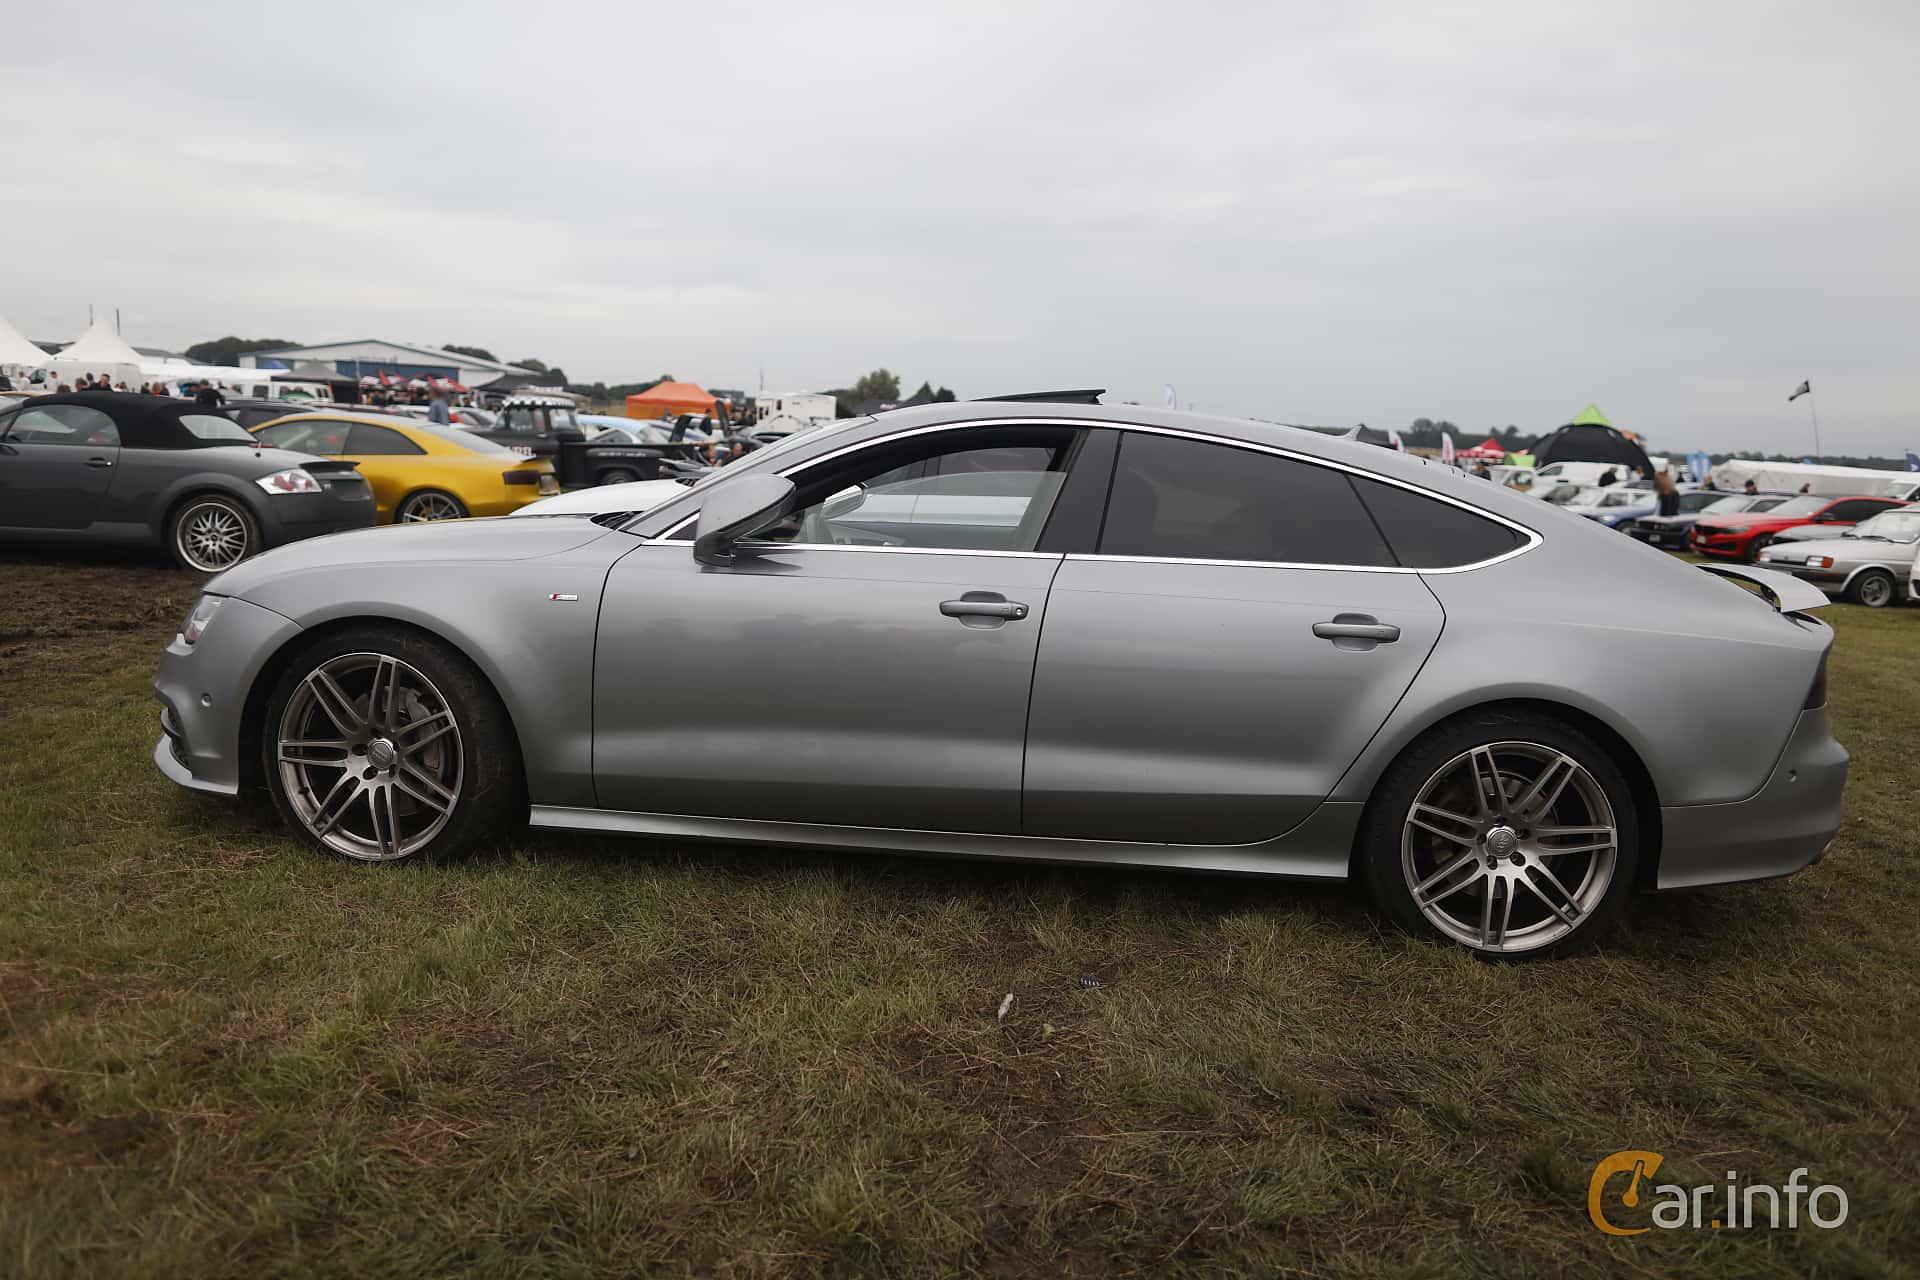 Kelebihan Audi A7 3.0 Tdi Review